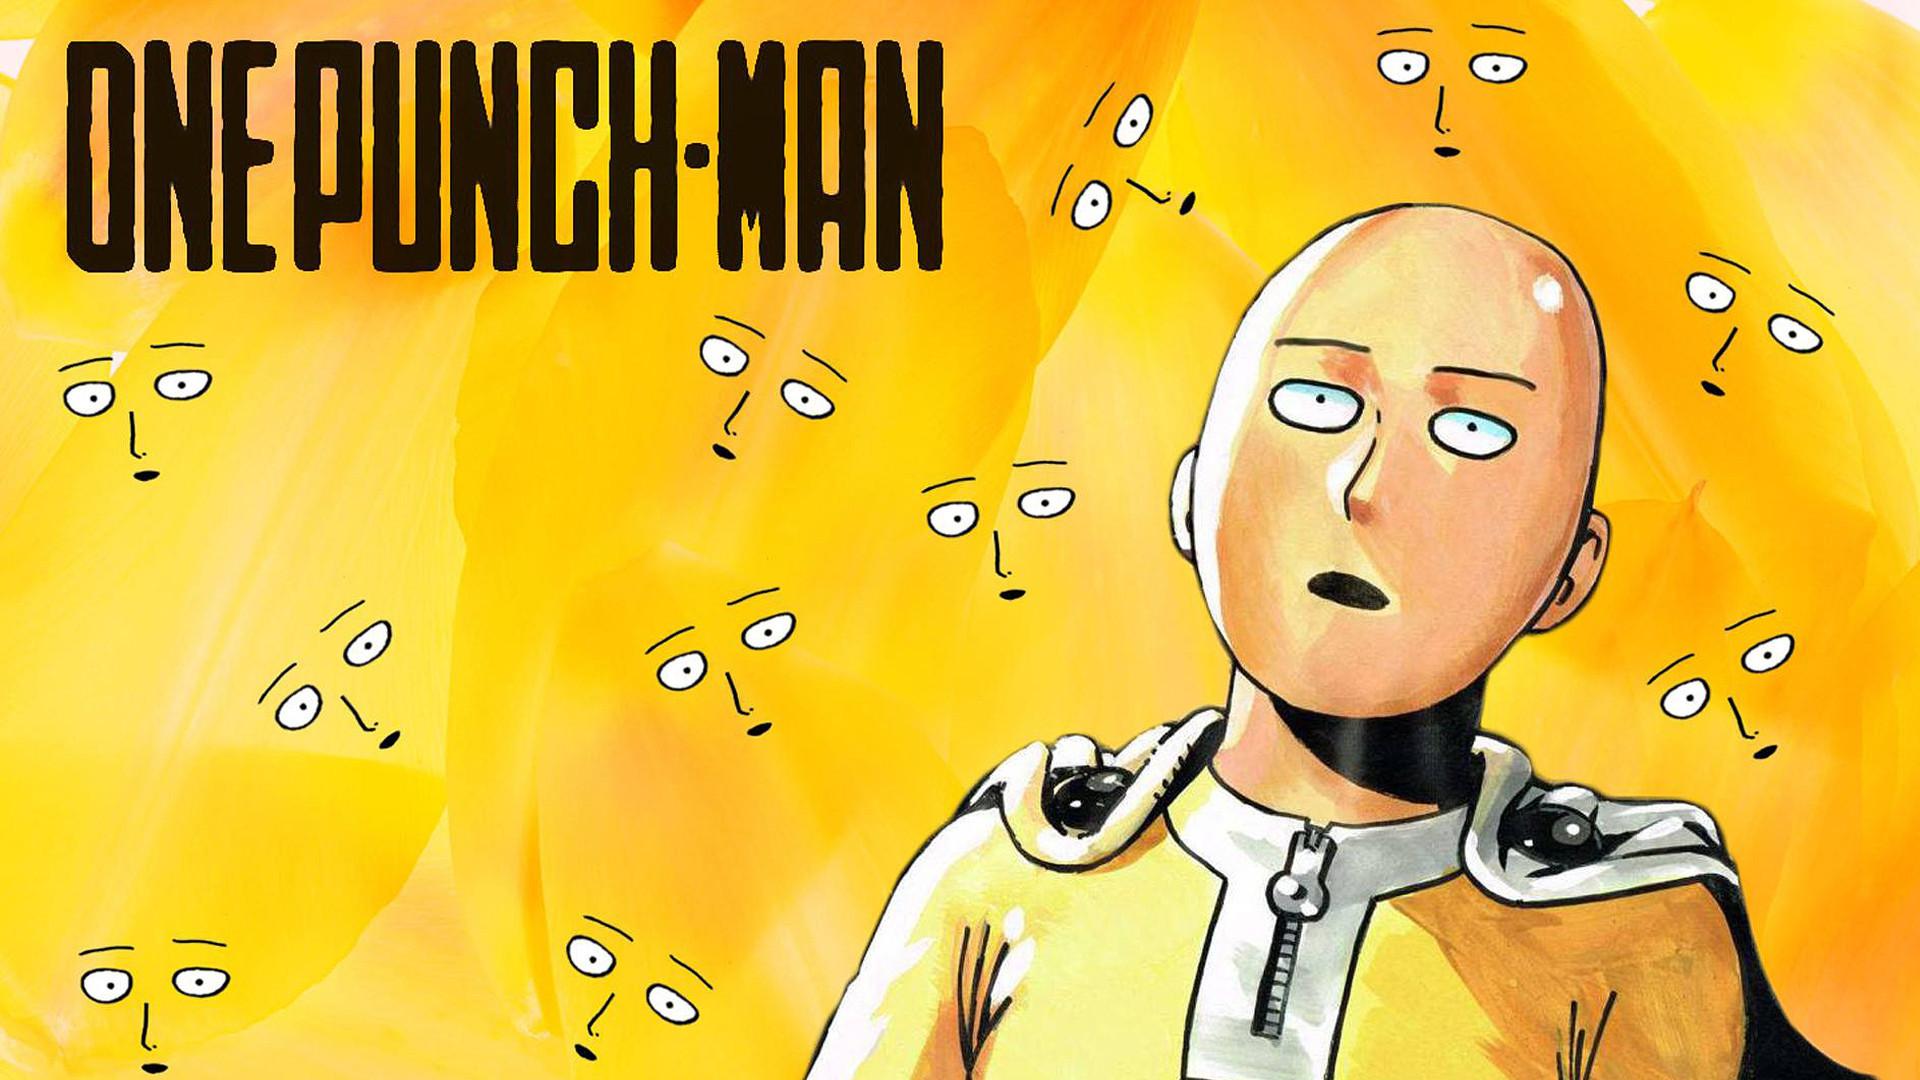 Cool Saitama Images - One Punch Man Saitama Wallpapers (76+ images)